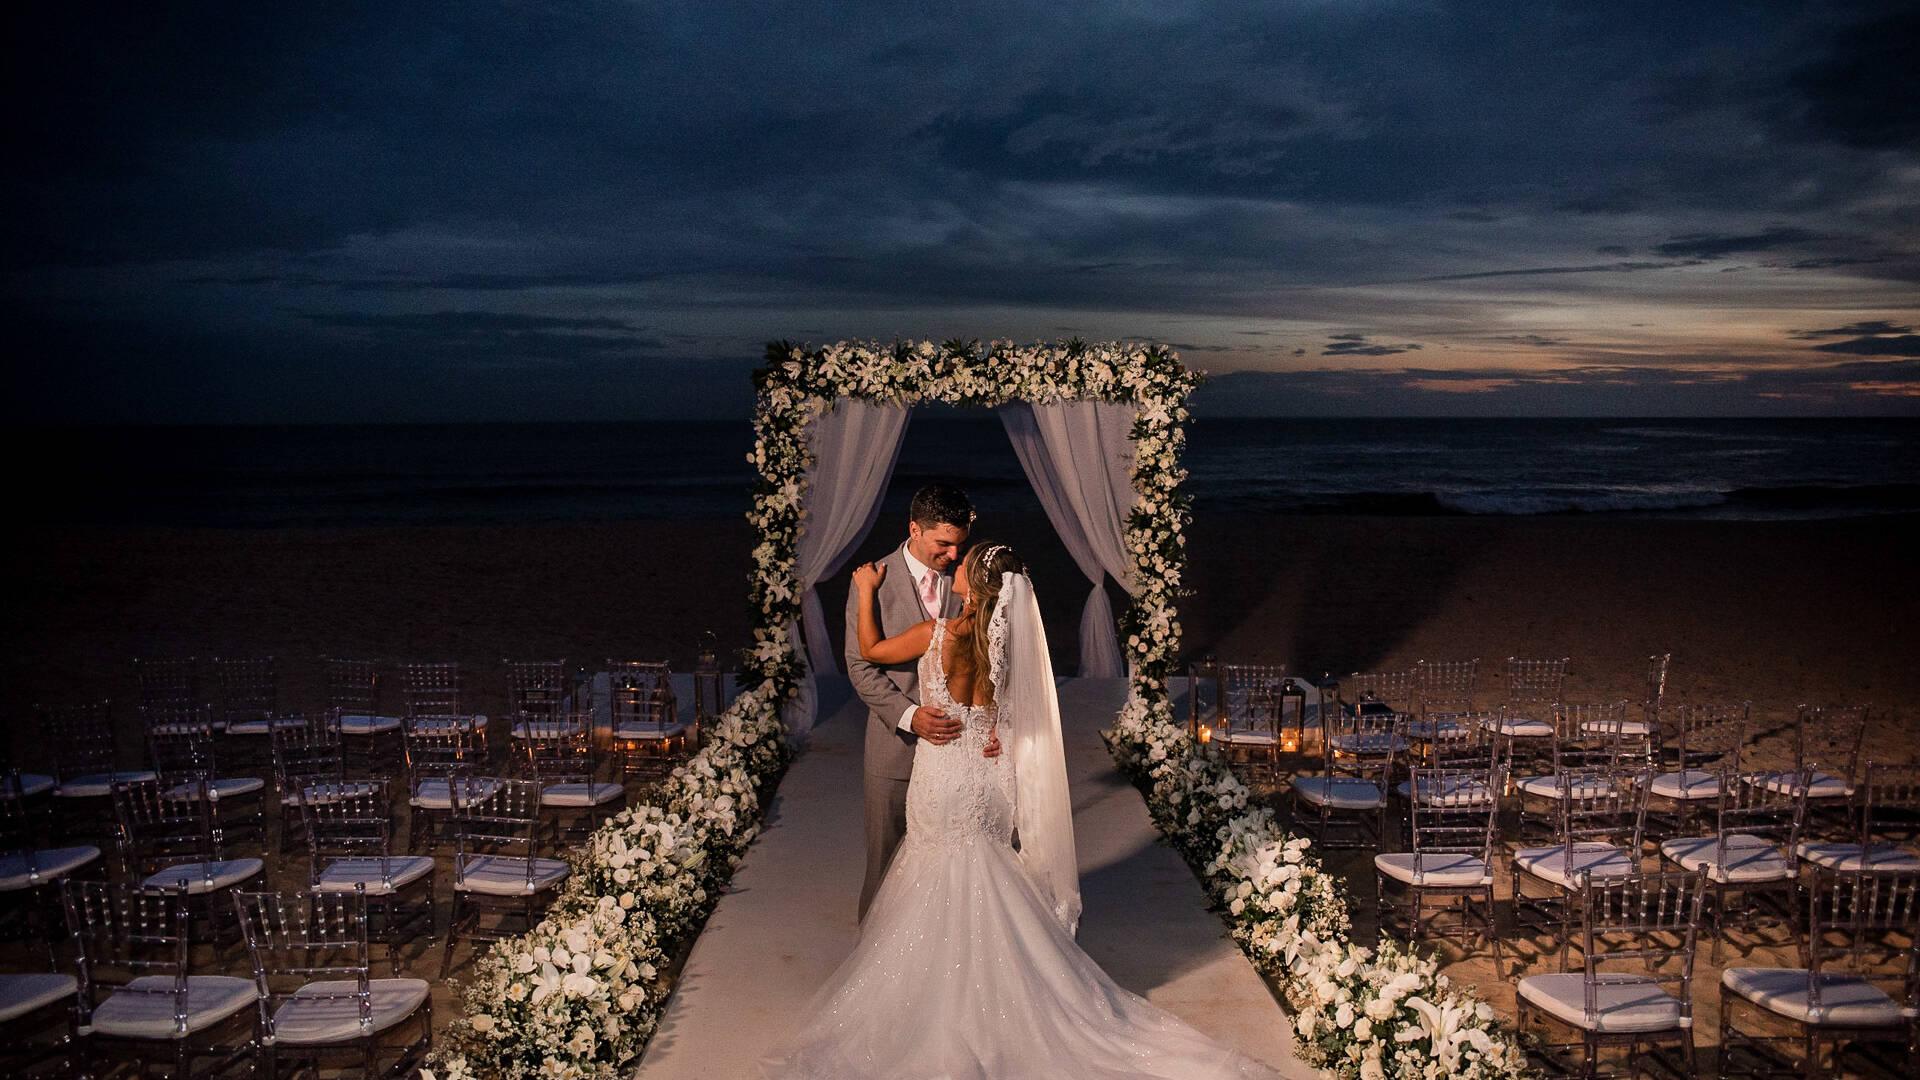 Casamento na Praia de Recreio-RJ